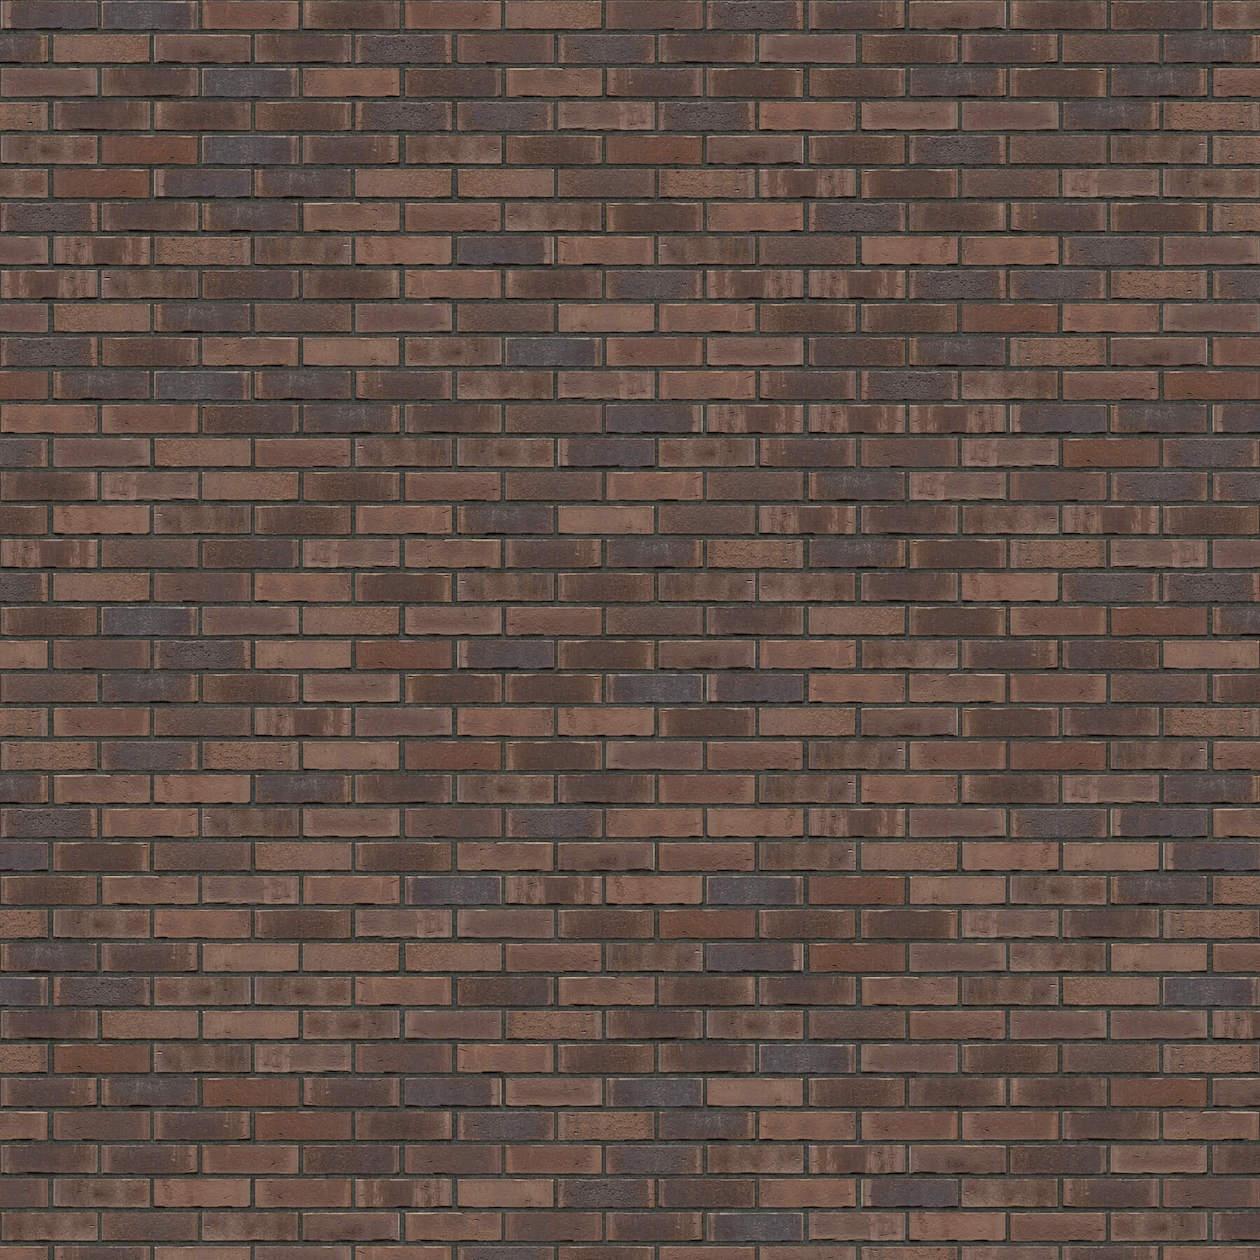 Puna-cigla-FeldHaus-Klinker-brick-house-nf-k-745-Antracit Fuga